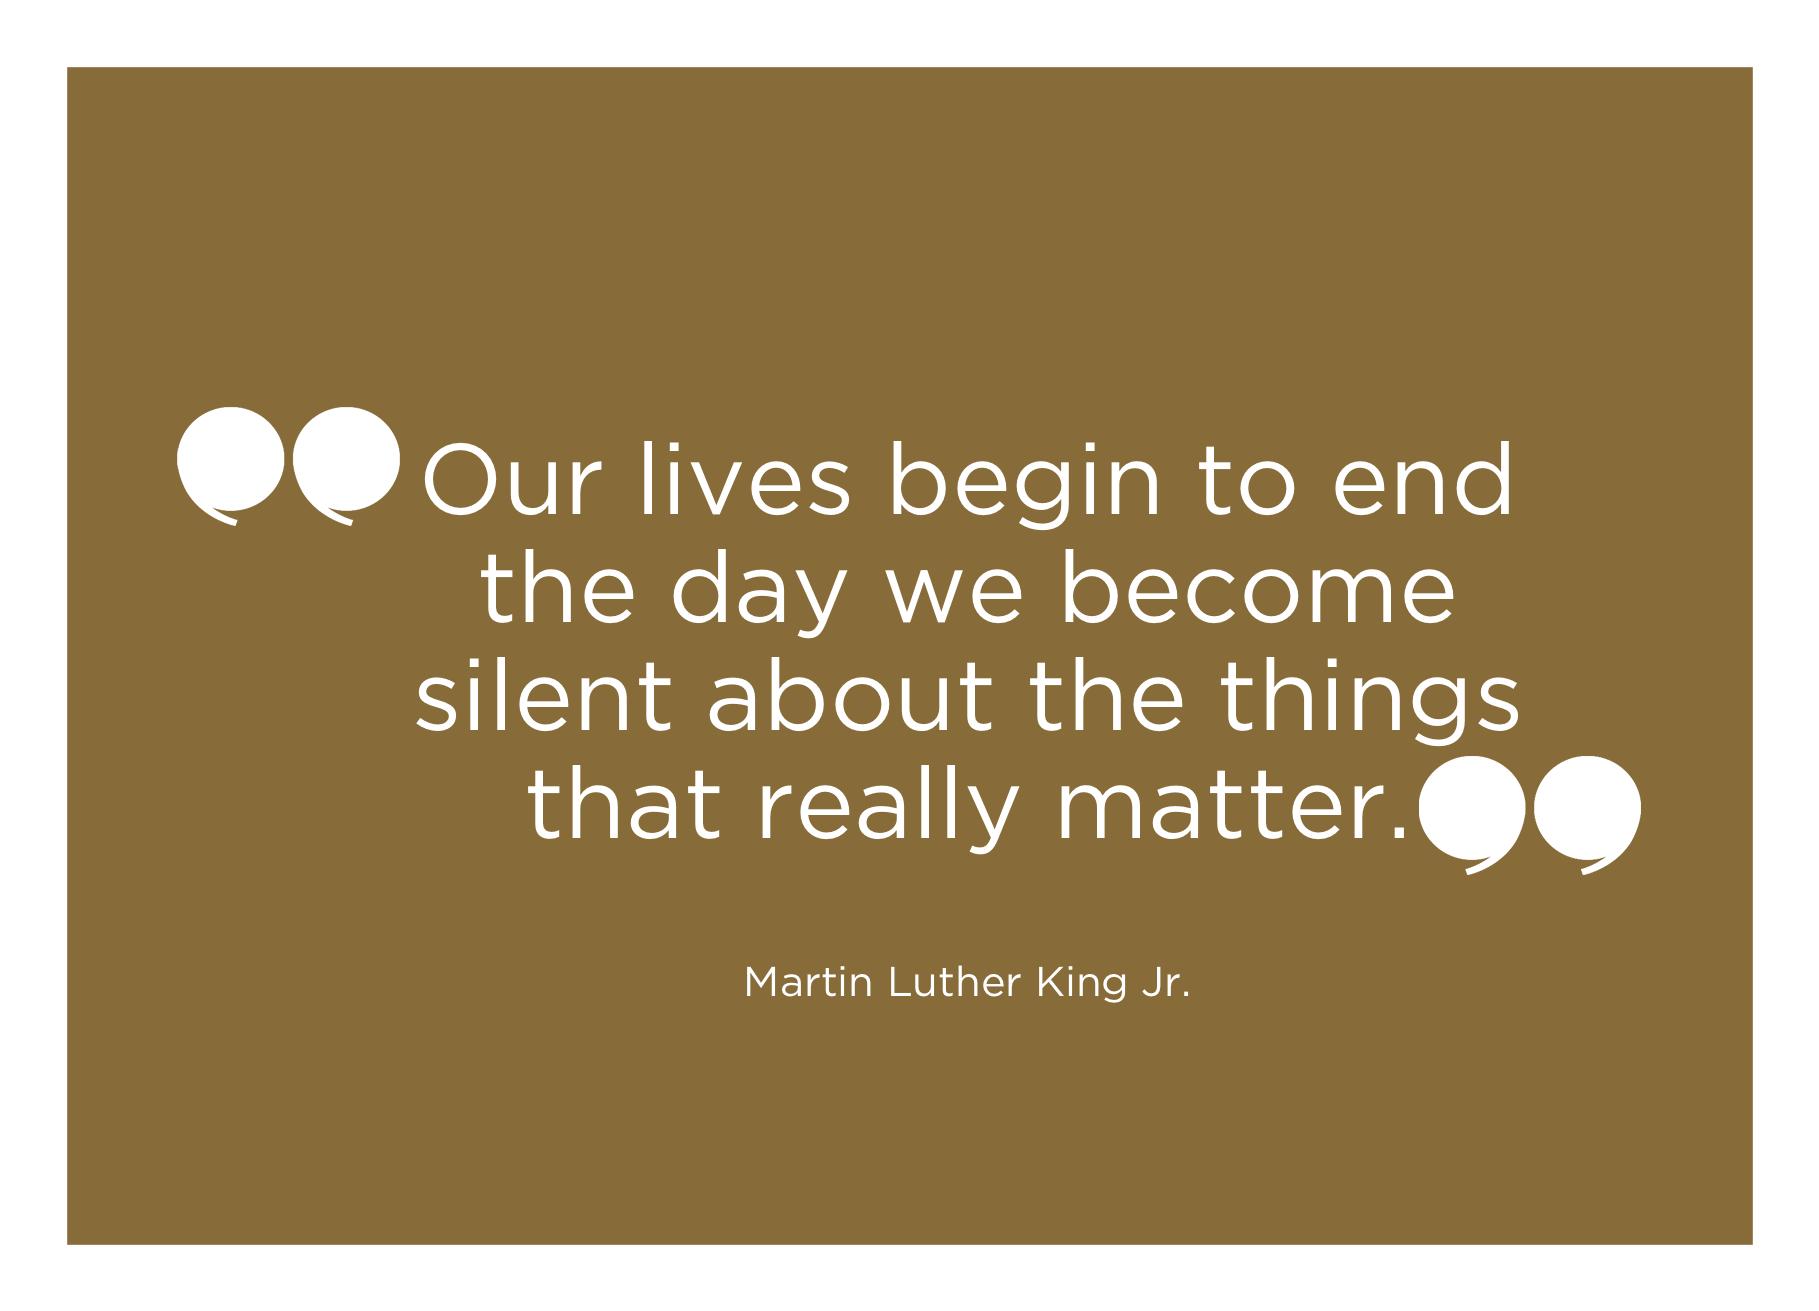 MLK on having a voice